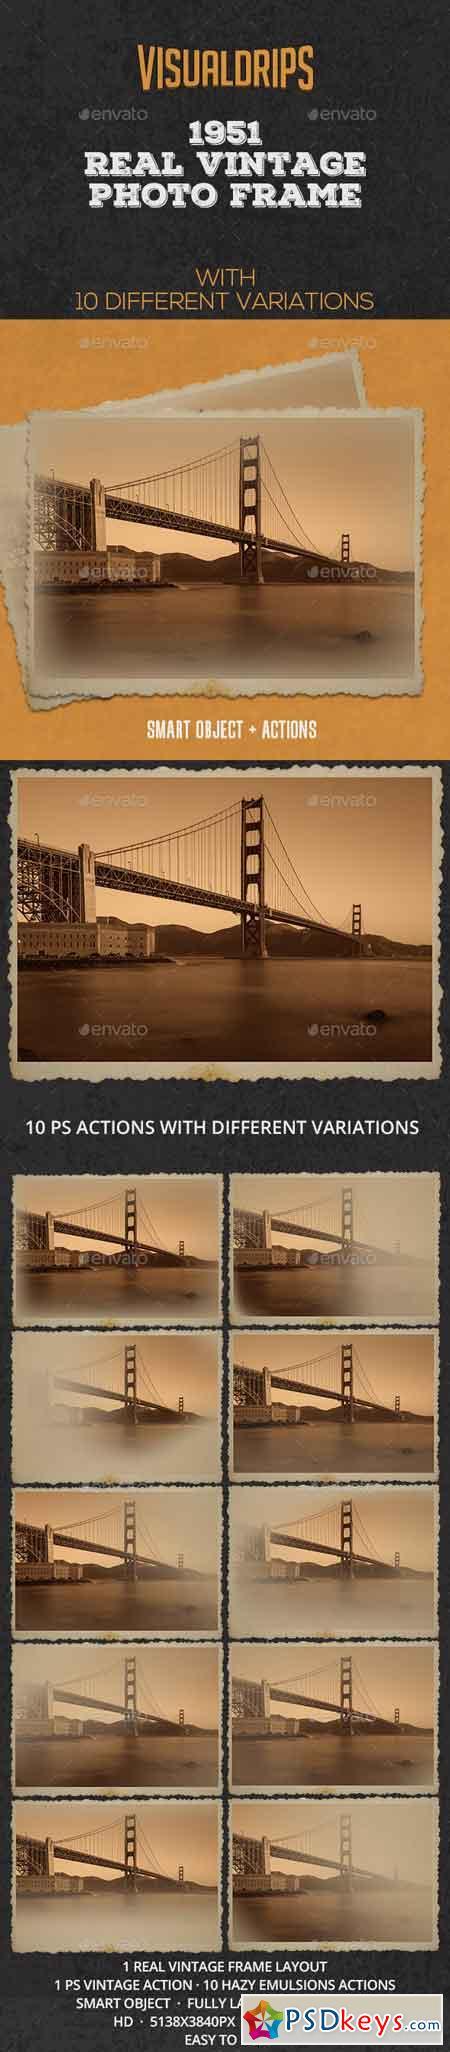 1951 Vintage Frame Photoshop Template 21954083